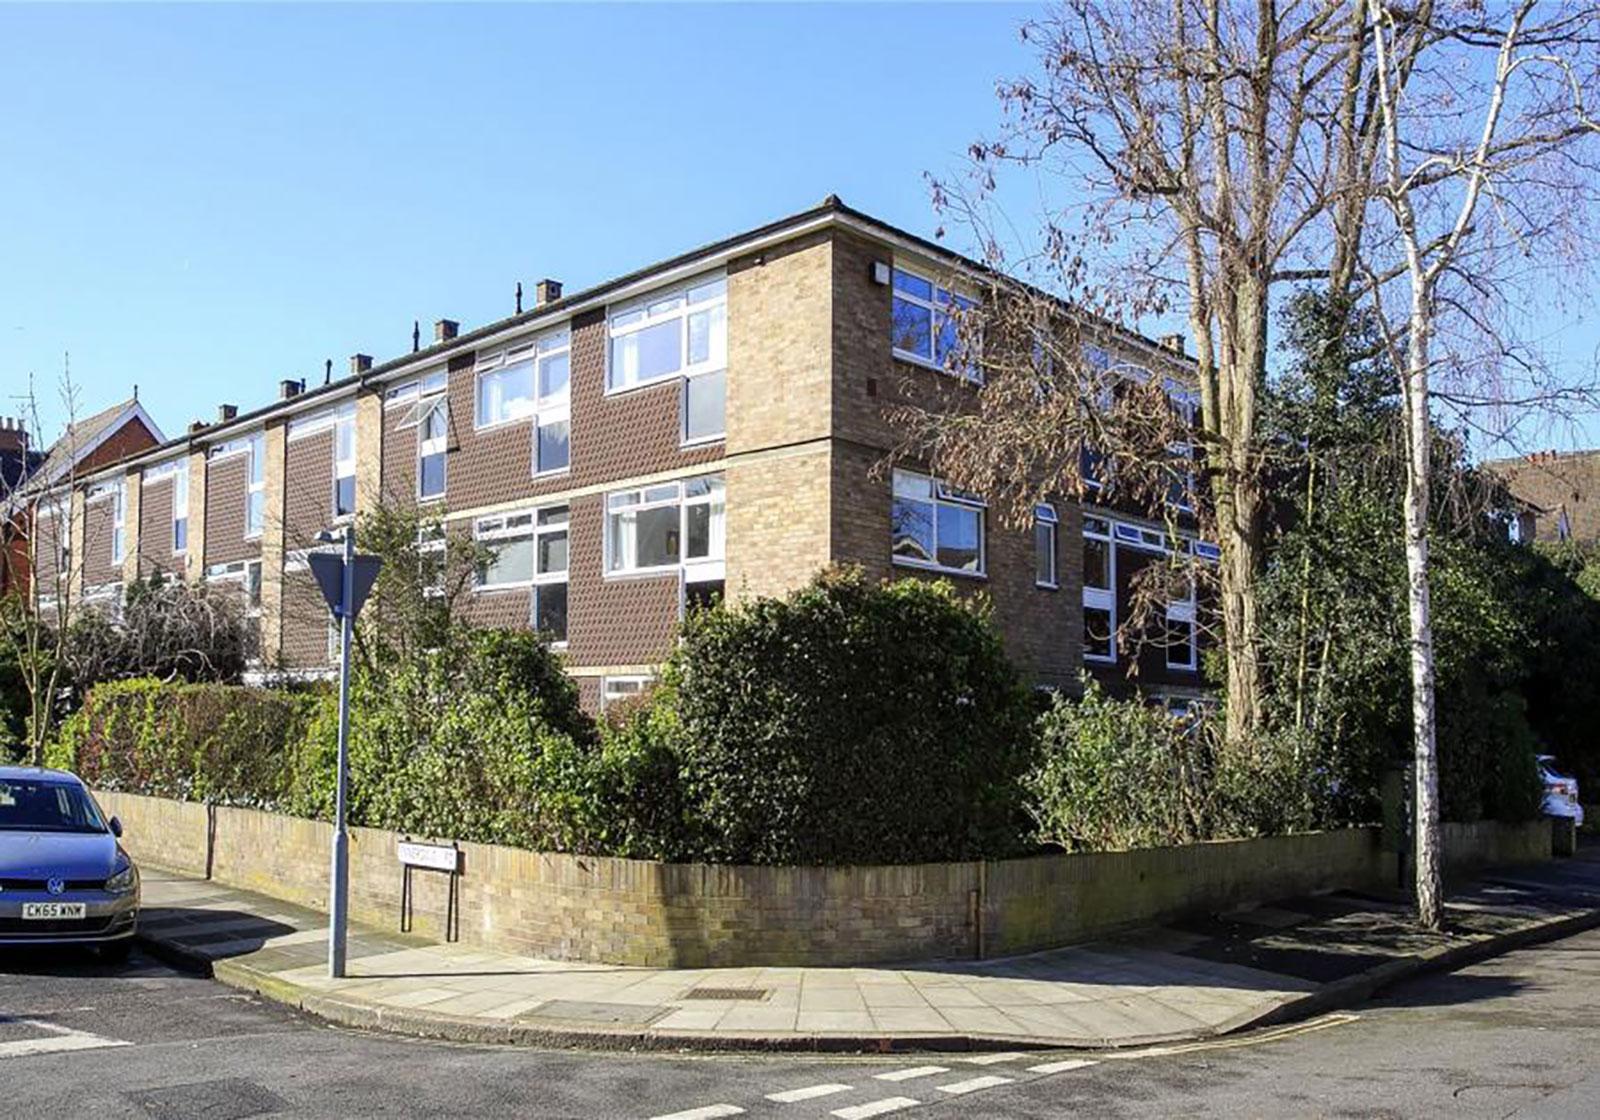 63 The Avenue Kew, Richmond, TW9 2AH - Antony Roberts